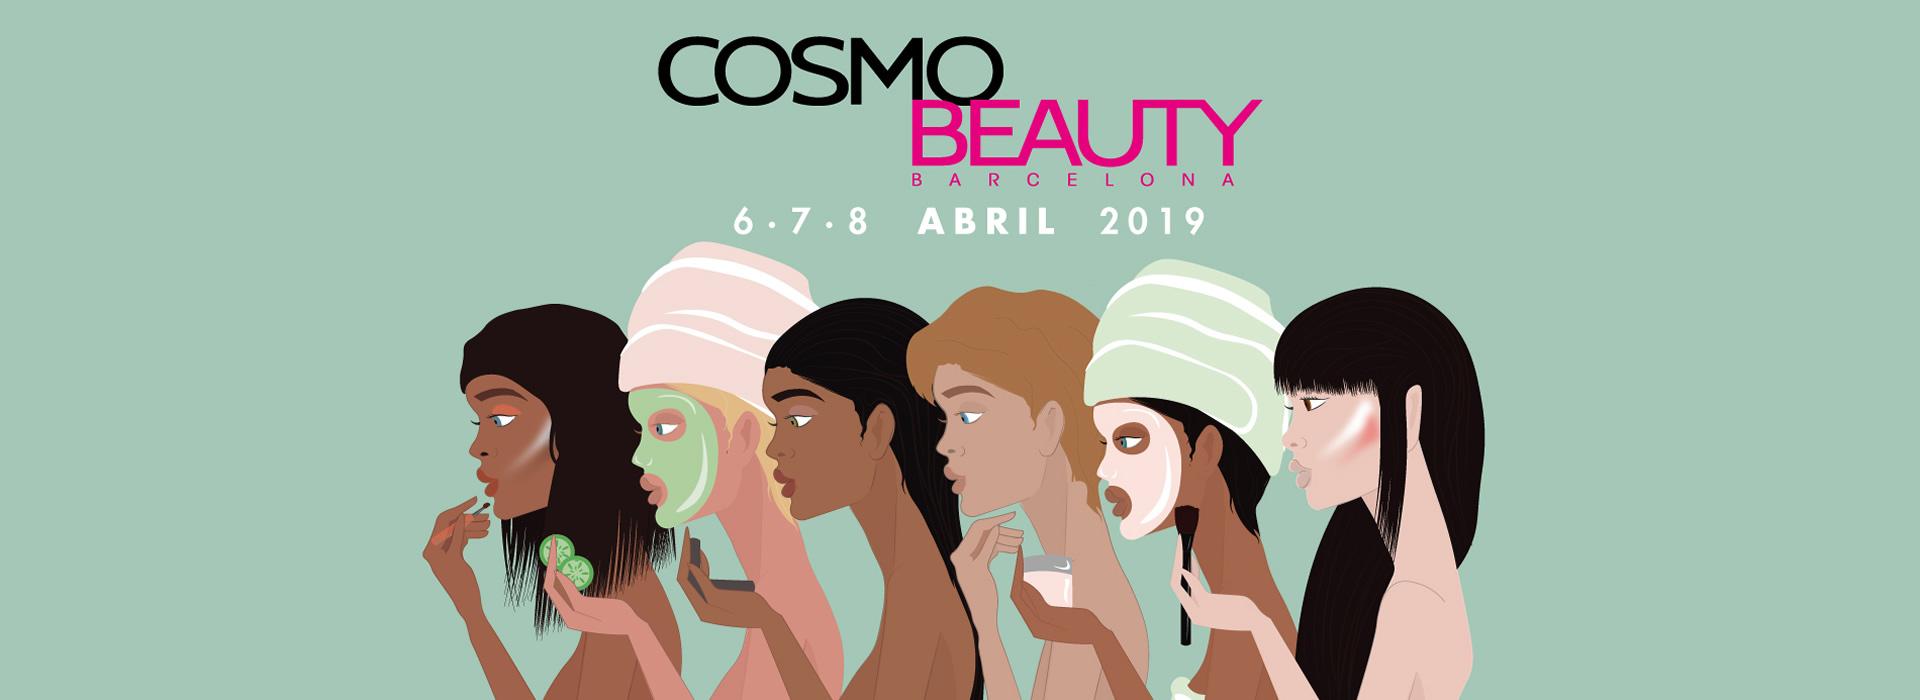 Cosmobeauty Barcelona - Imagen Congreso